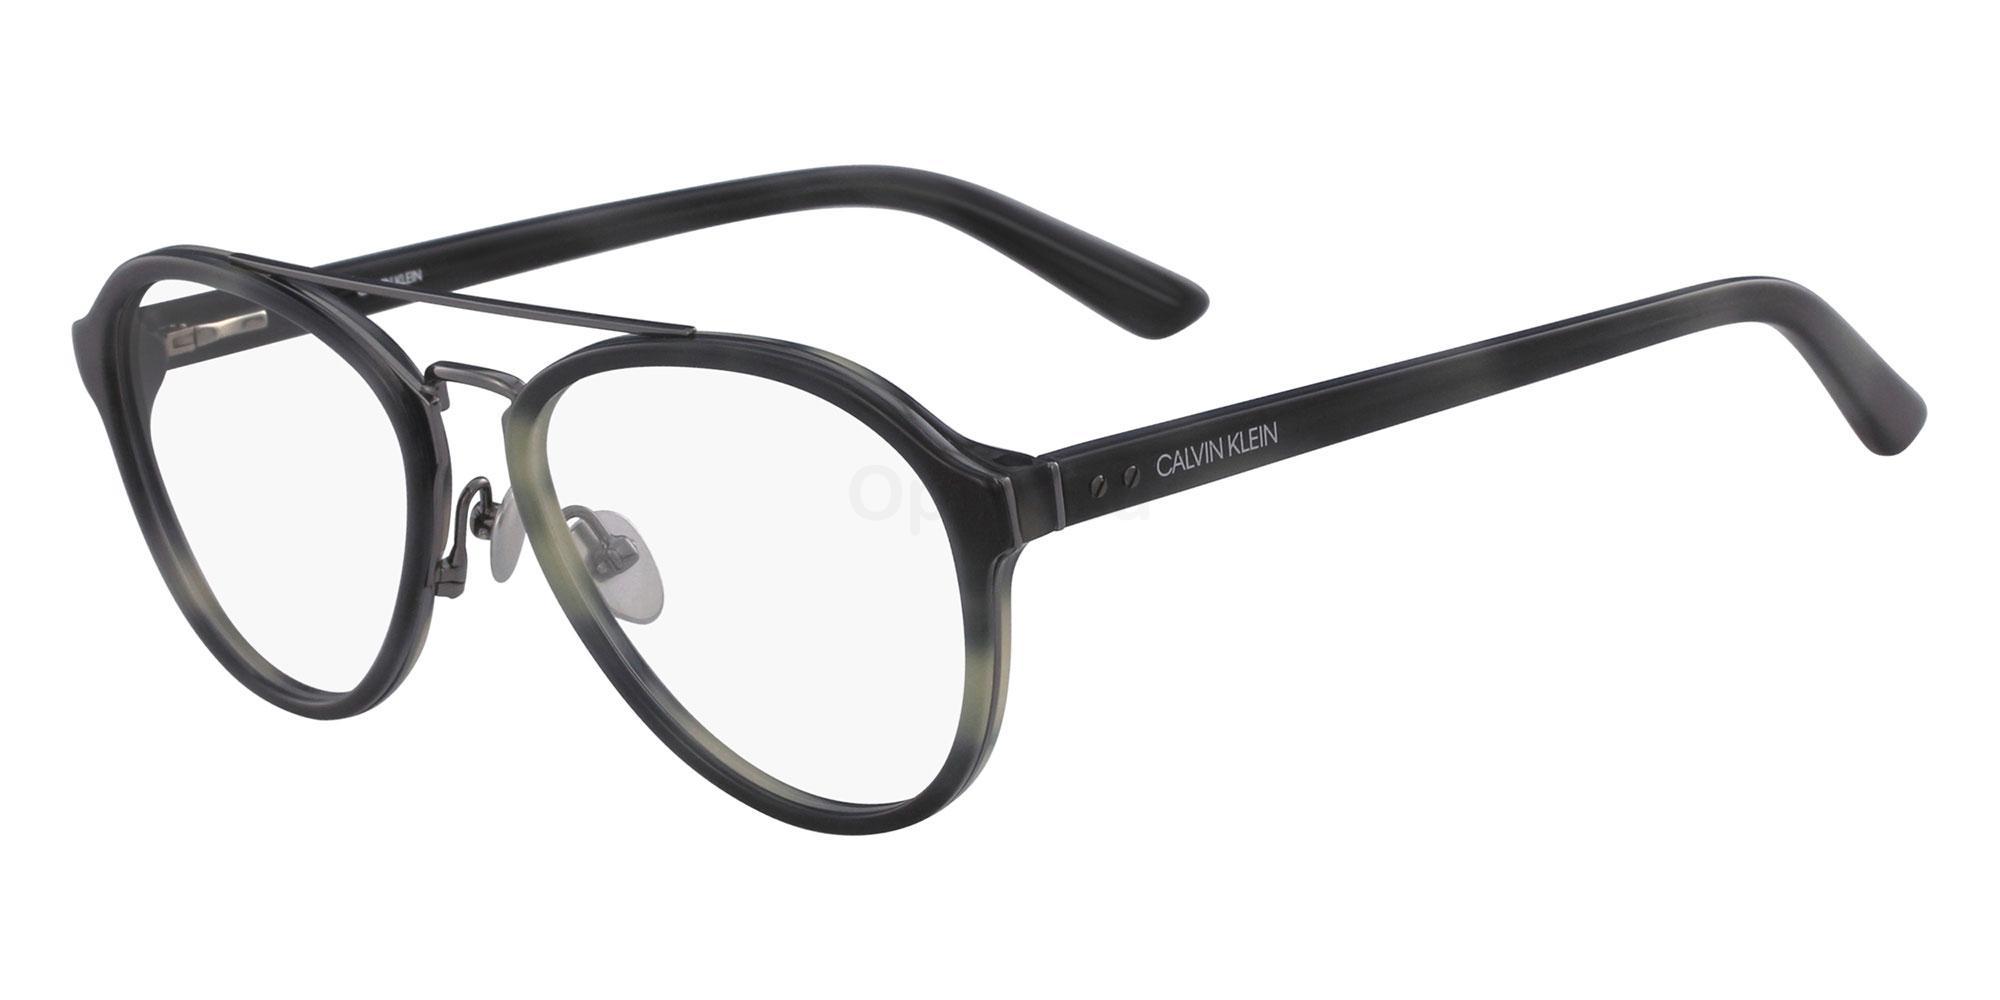 007 CK18511 Glasses, Calvin Klein